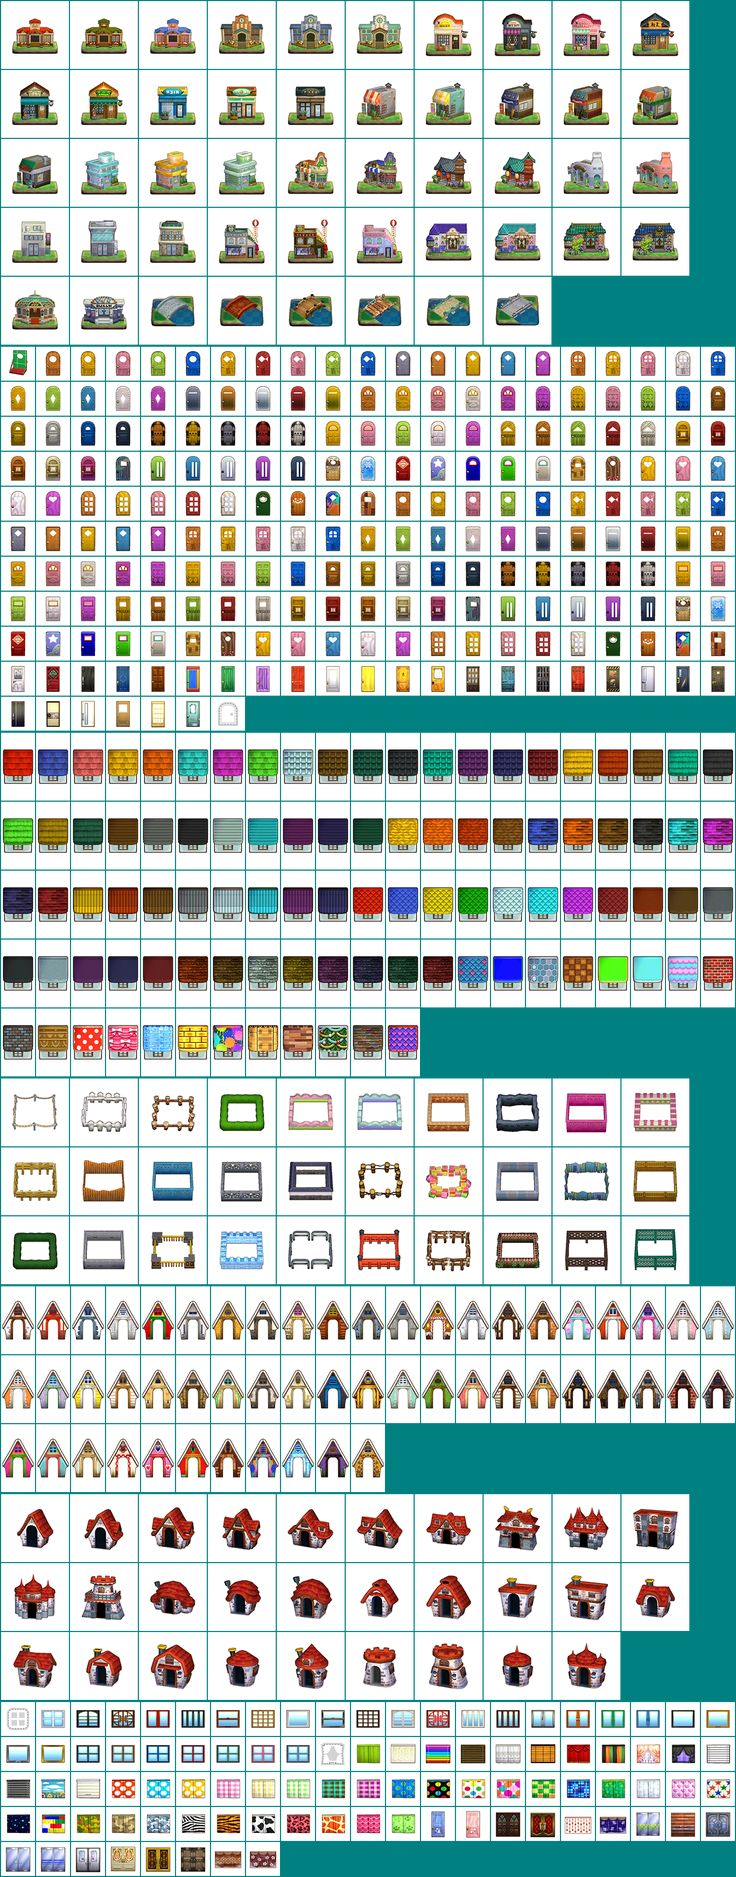 Happy home designer qr codes clothes star.